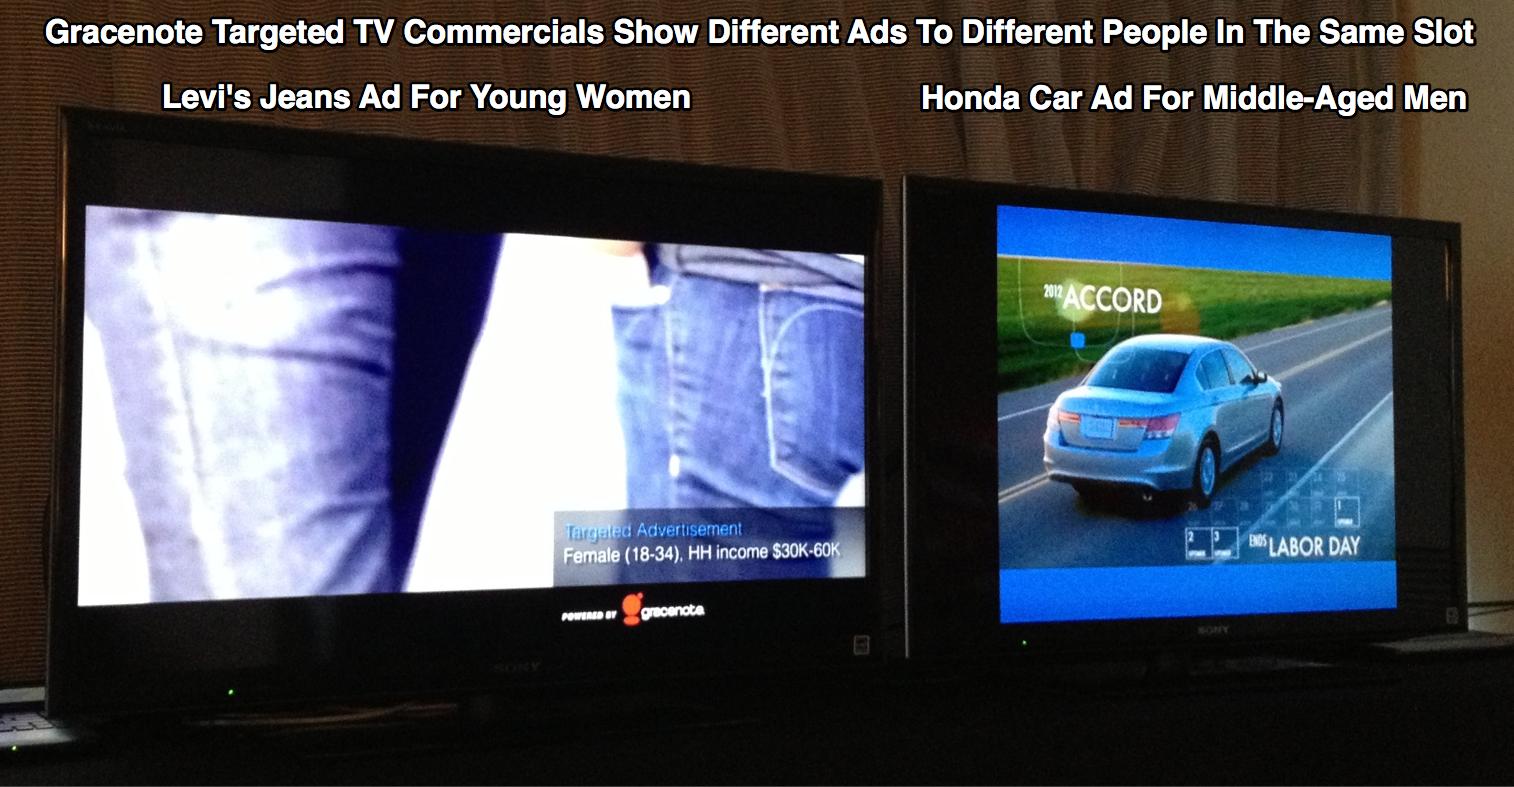 Gracenote Targeted Advertisements Levis Honda